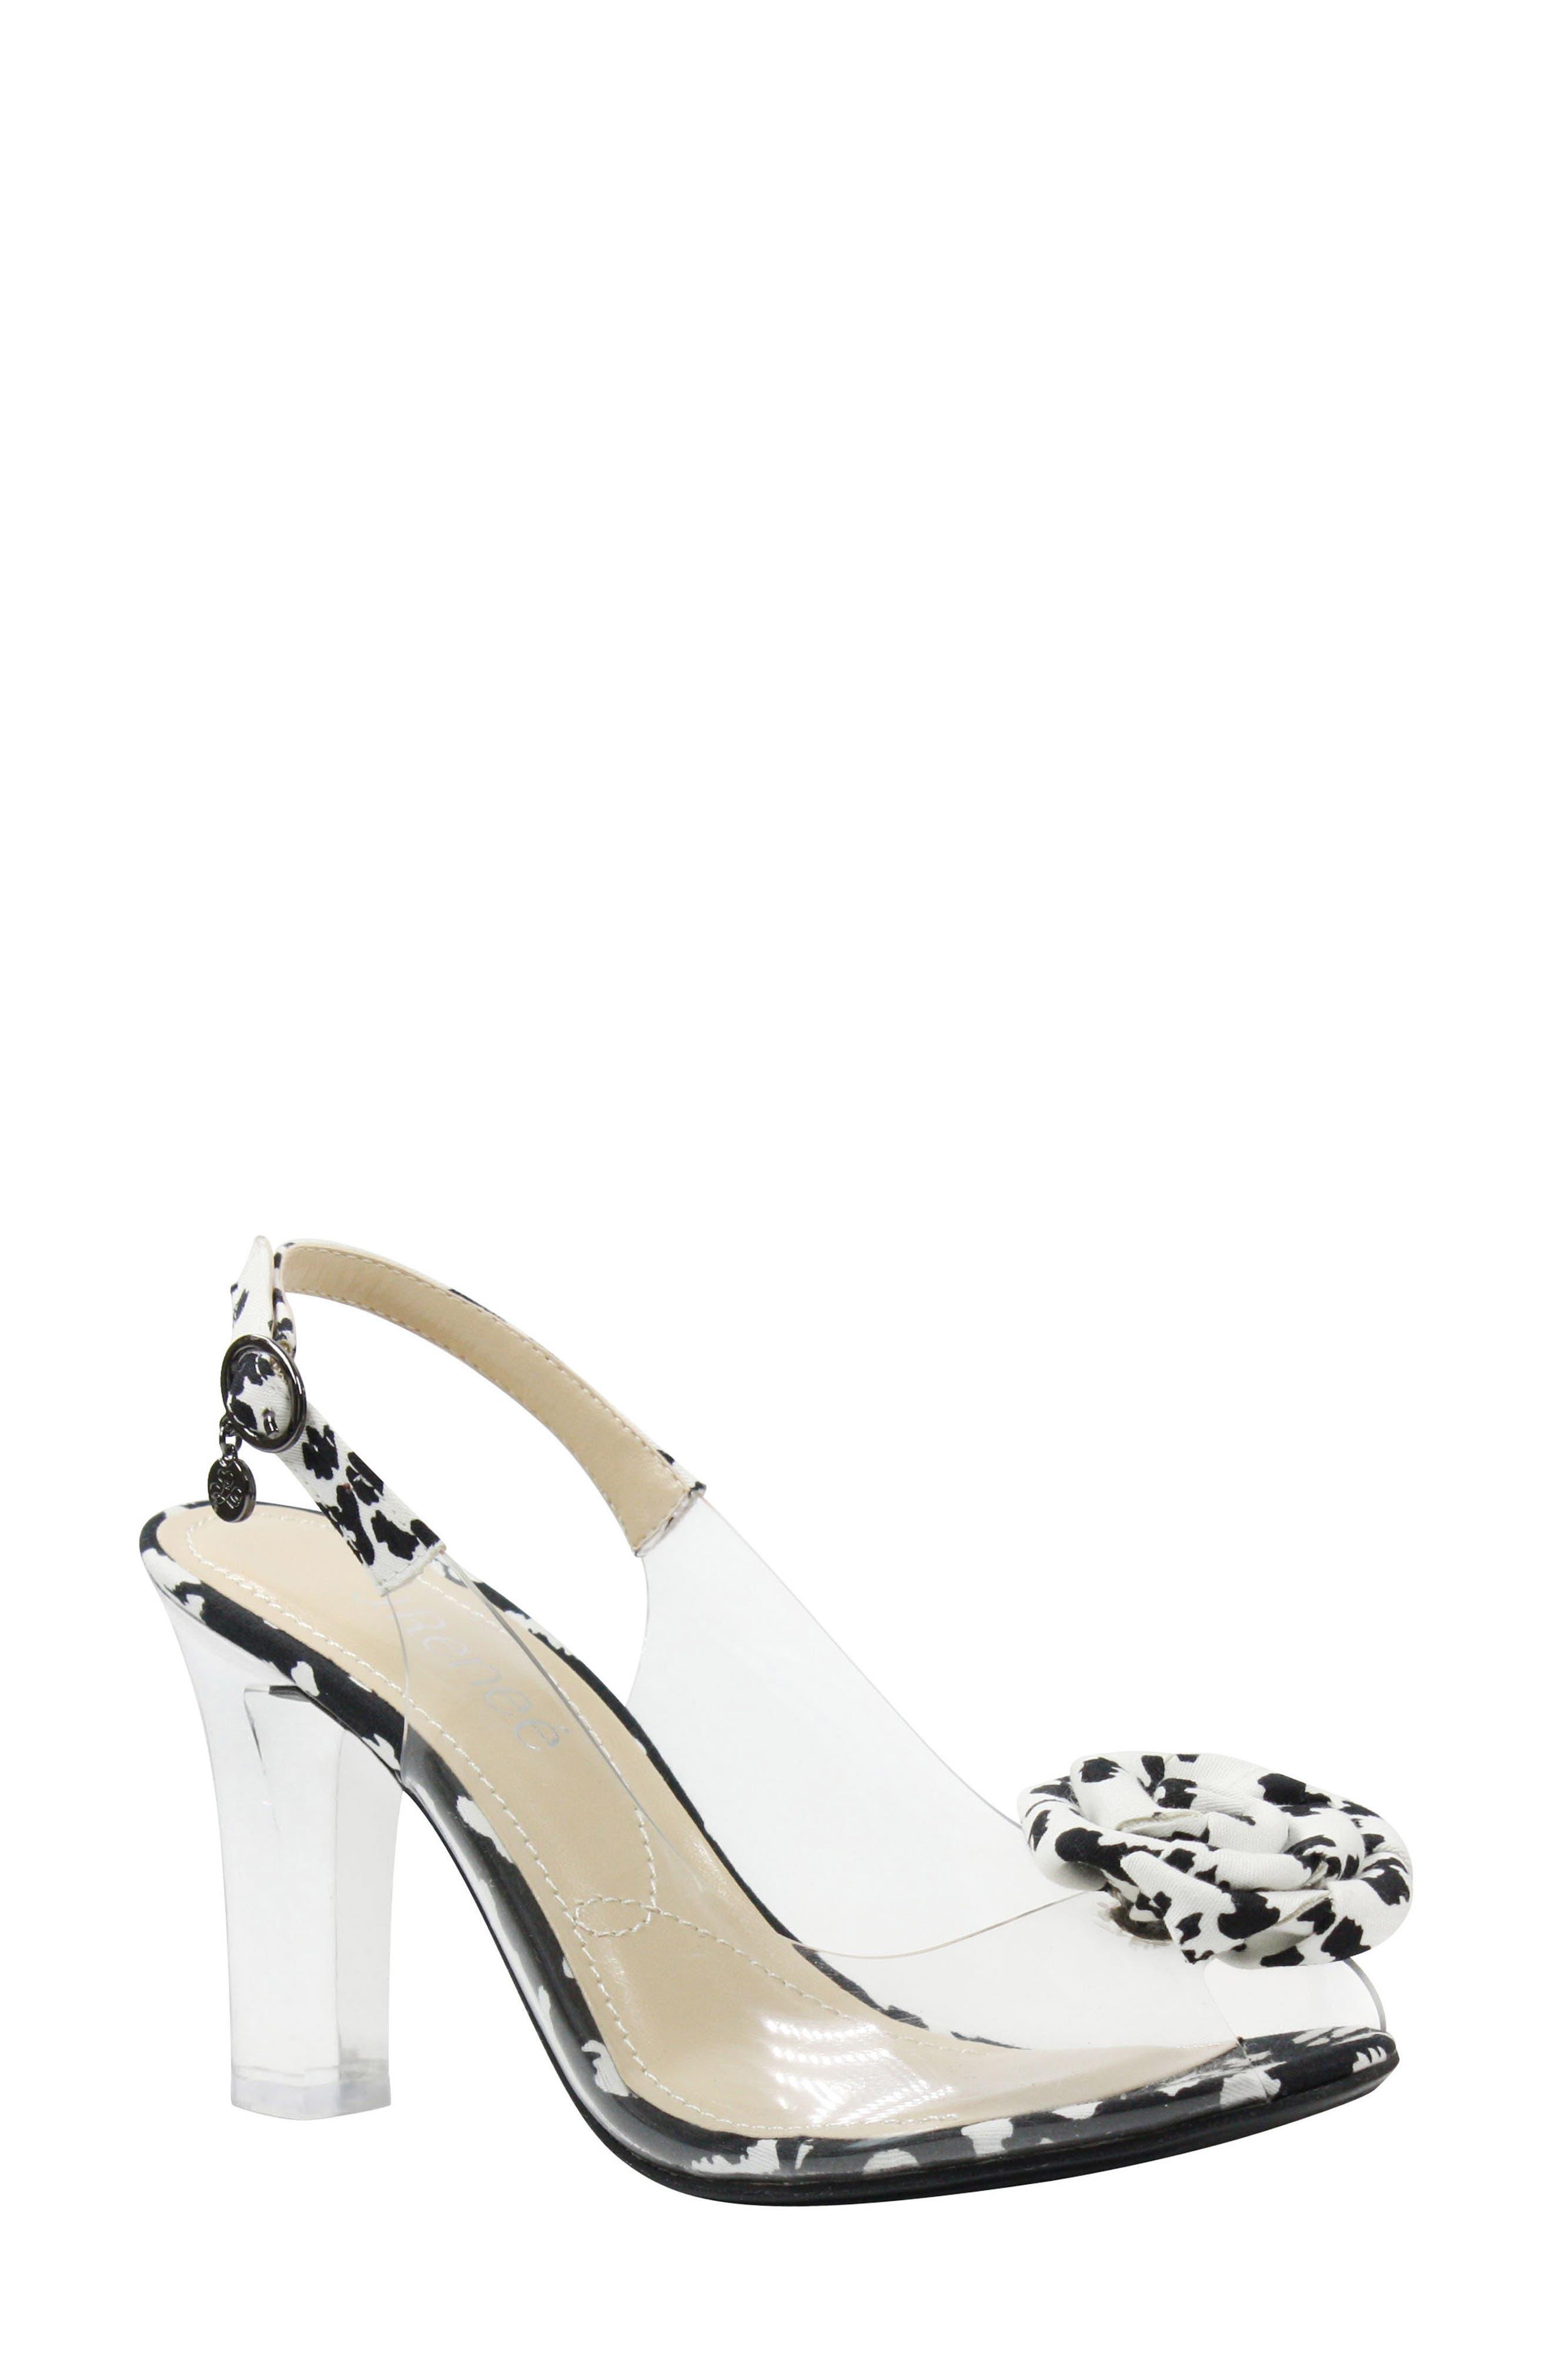 Adoracion Slingback Sandal,                         Main,                         color, CLEAR/ BLACK/ WHITE